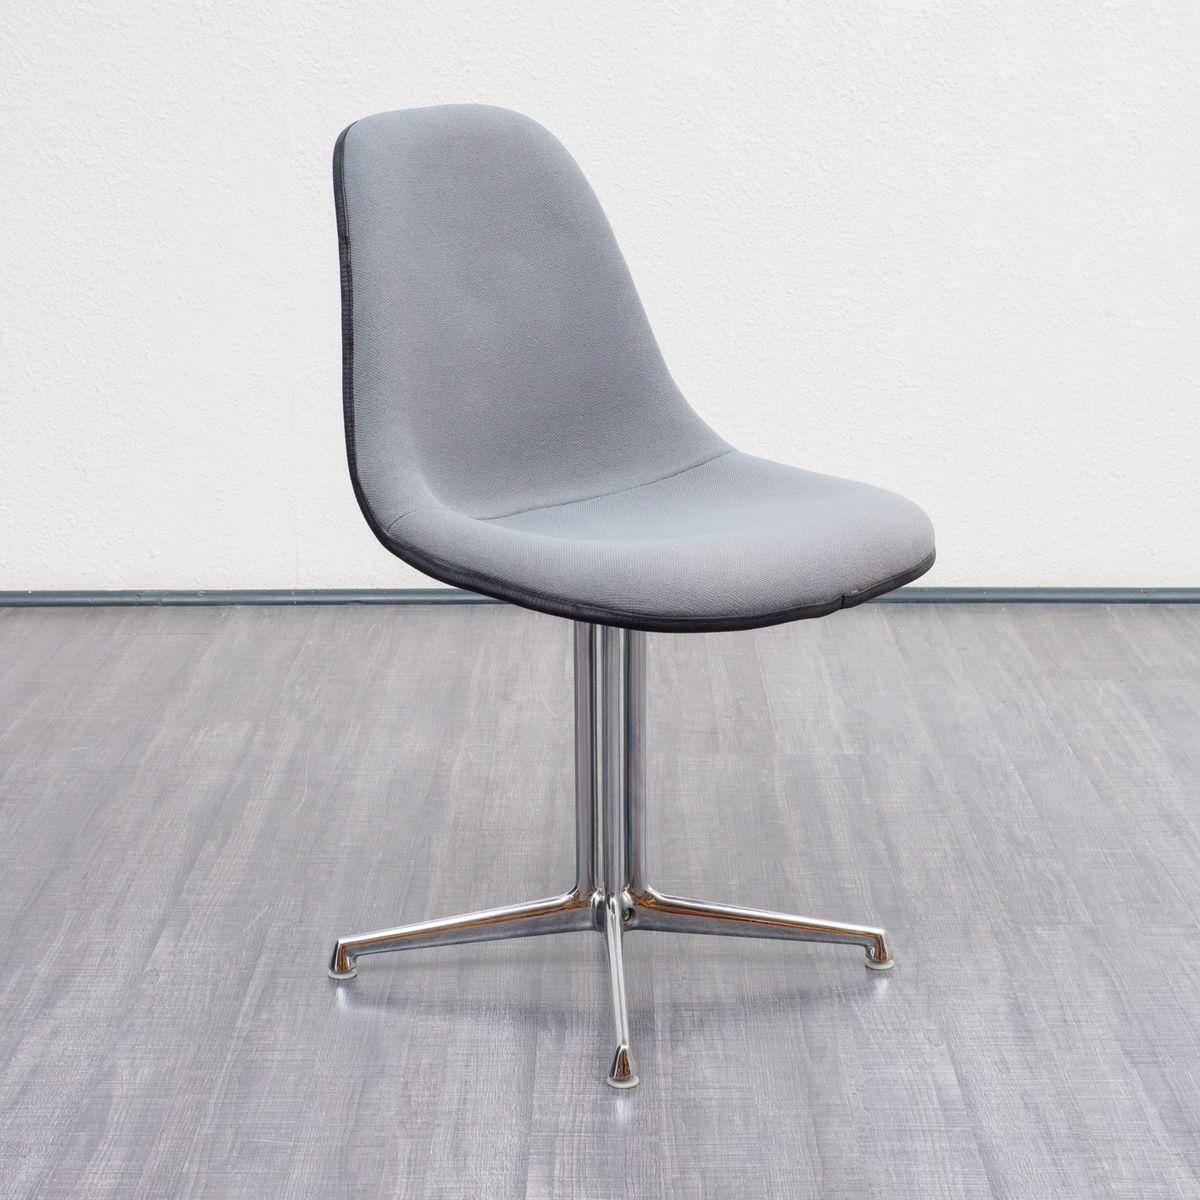 Vintage La Fonda Chair by Charles & Ray Eames for Vitra